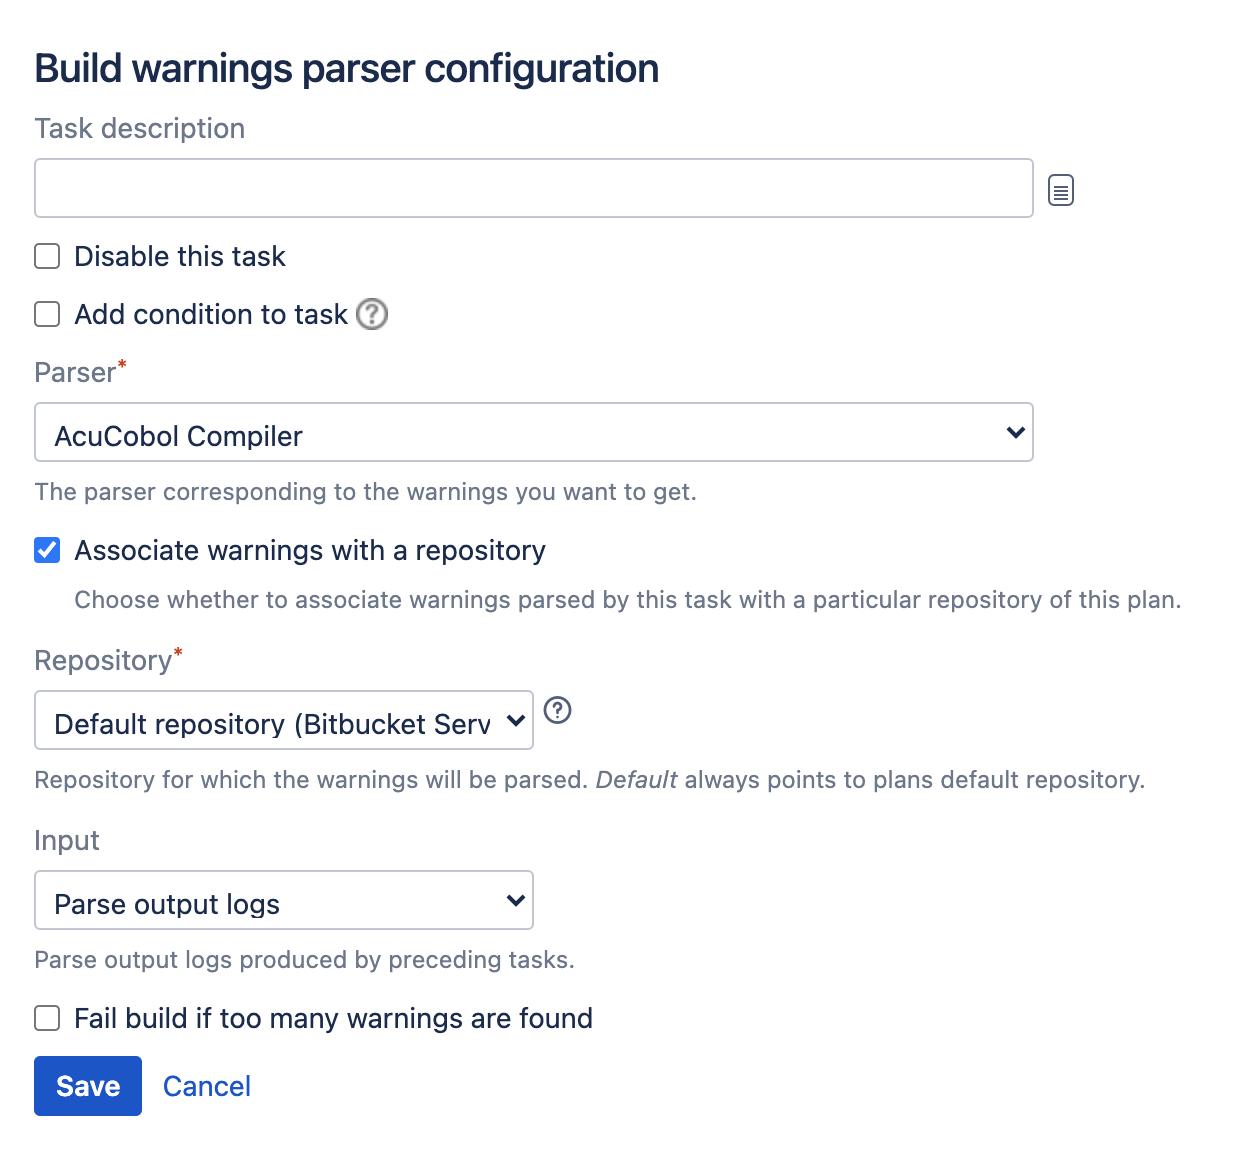 Build warnings parser task type configuration